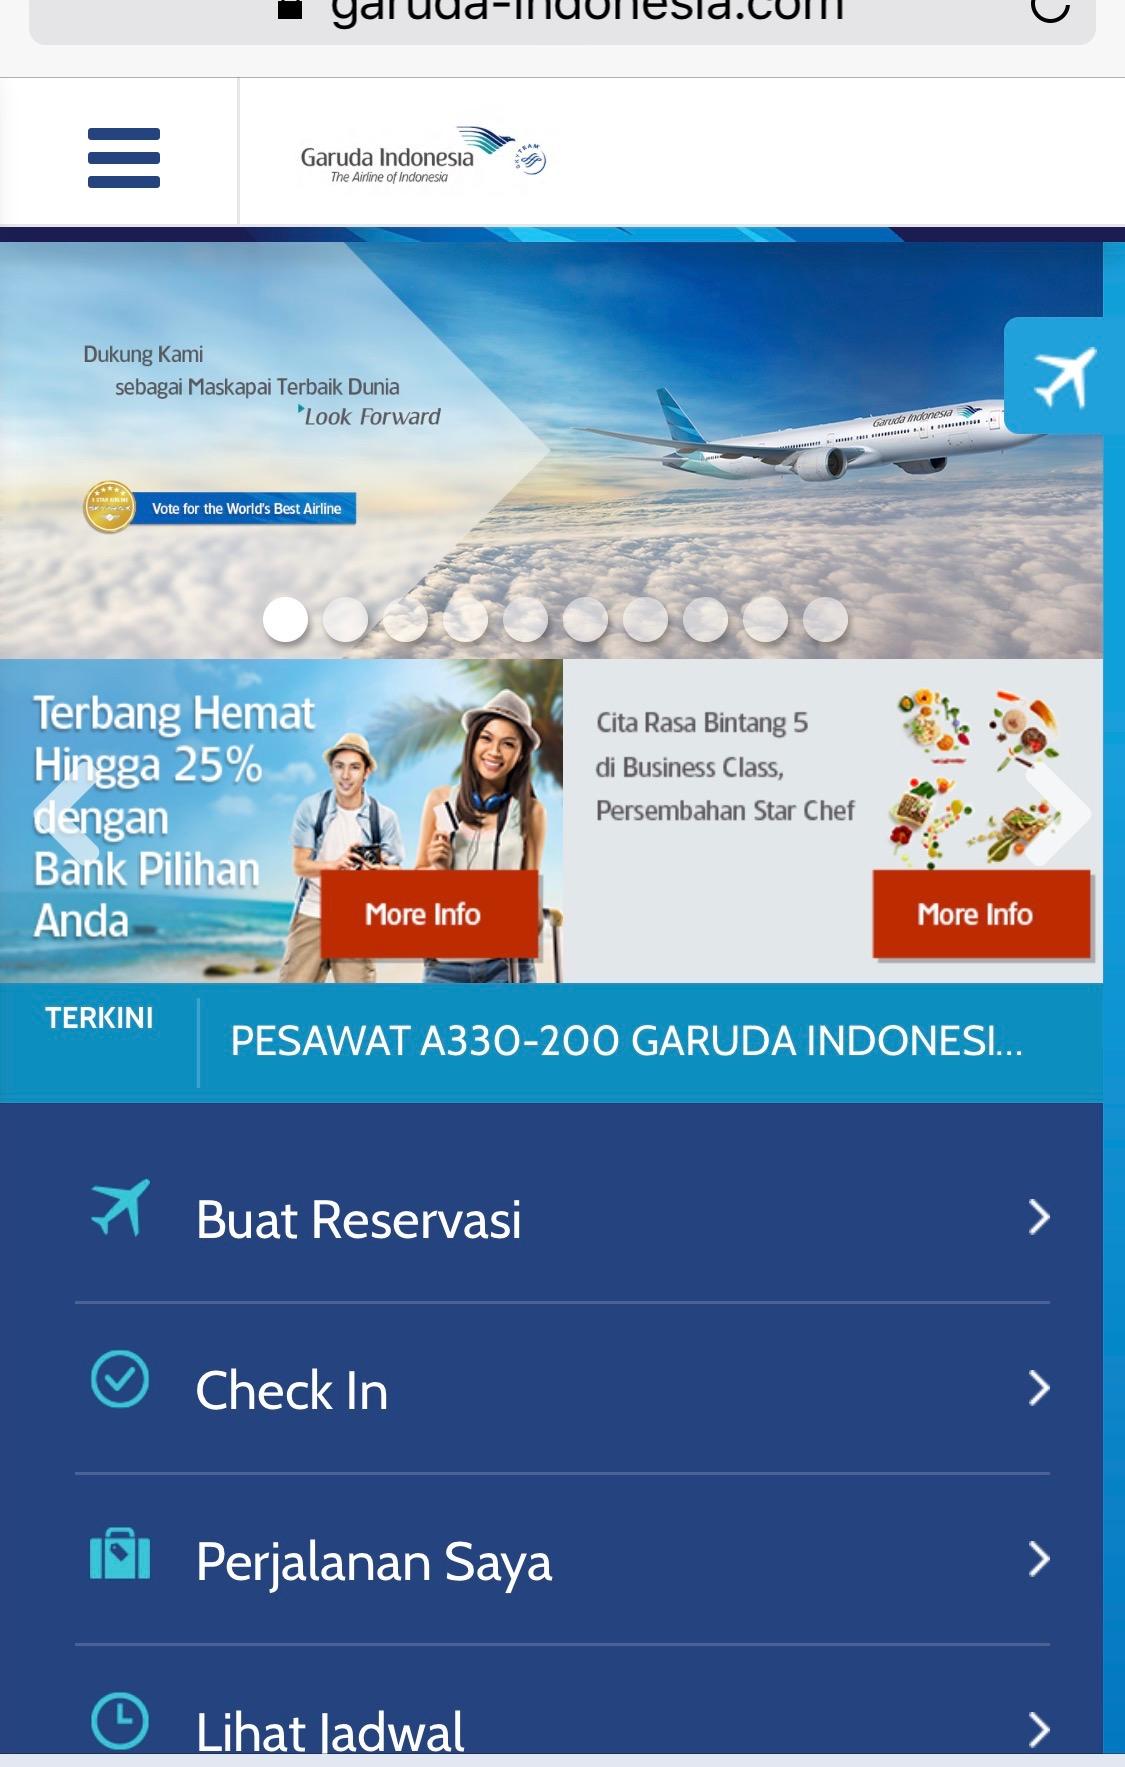 cara check in pesawat garuda indonesia skyscanner indonesia rh skyscanner co id